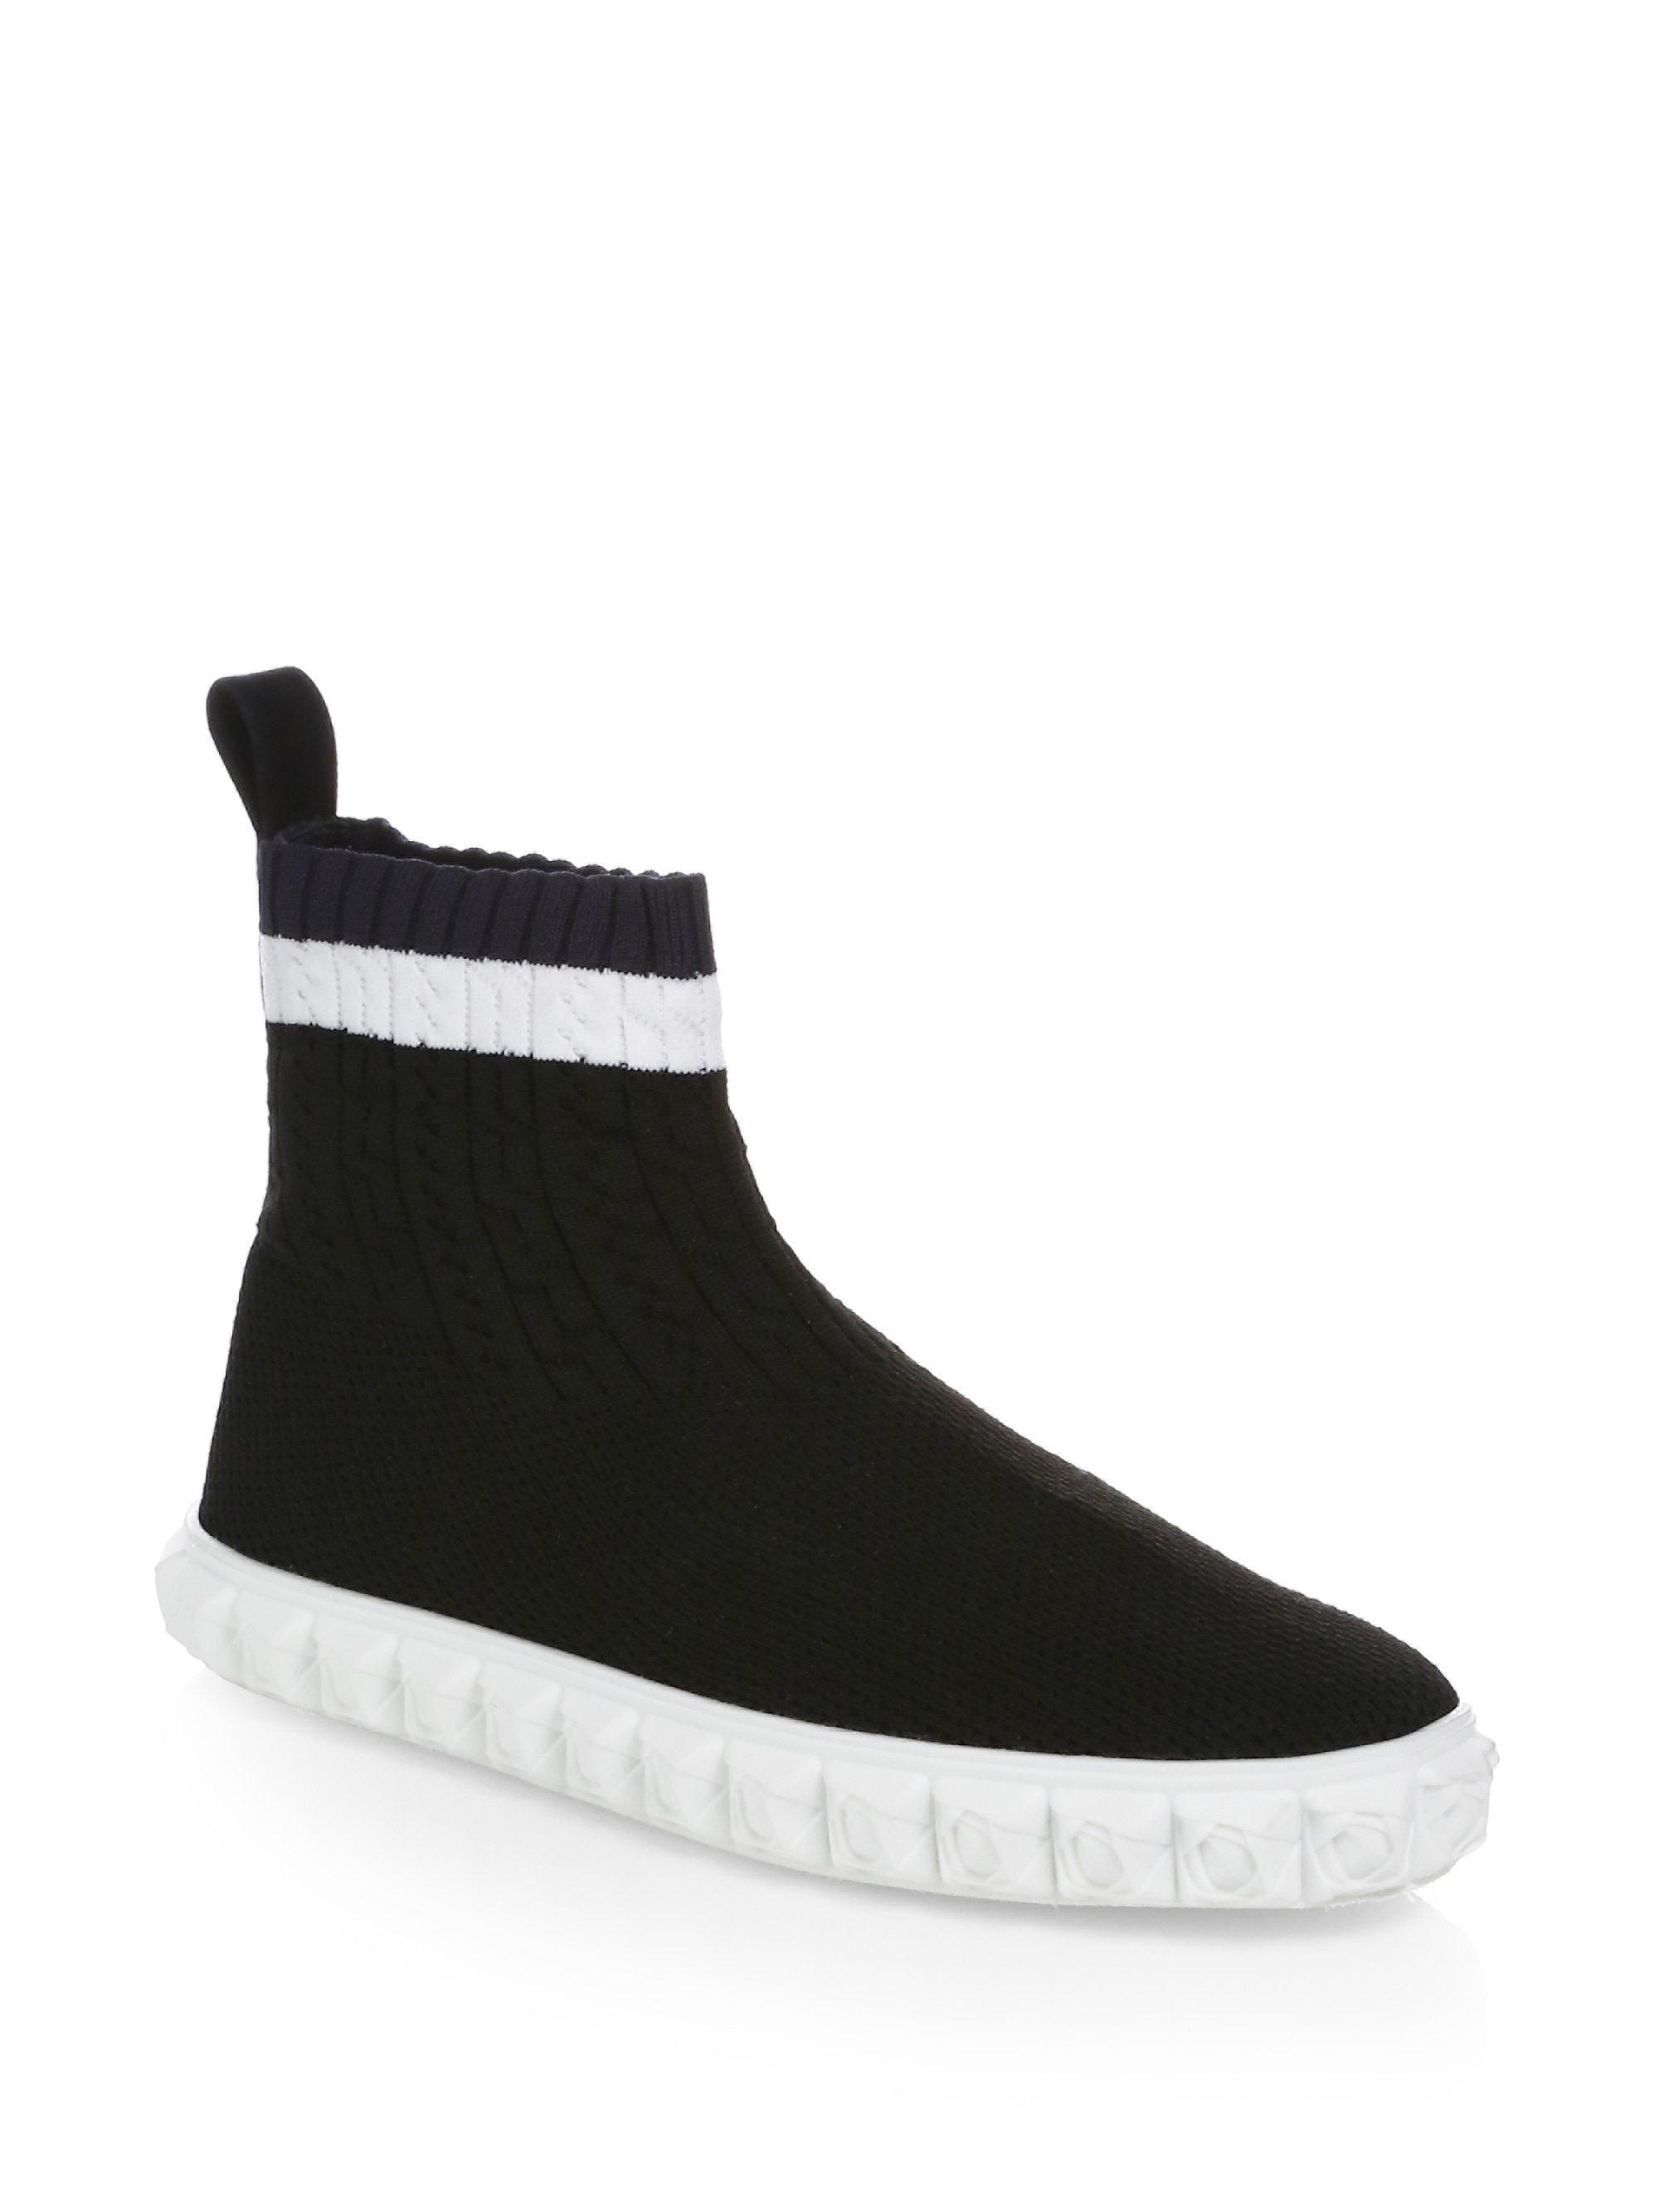 Stuart Weitzman Coverall High-Top Sock Sneaker xJcBM